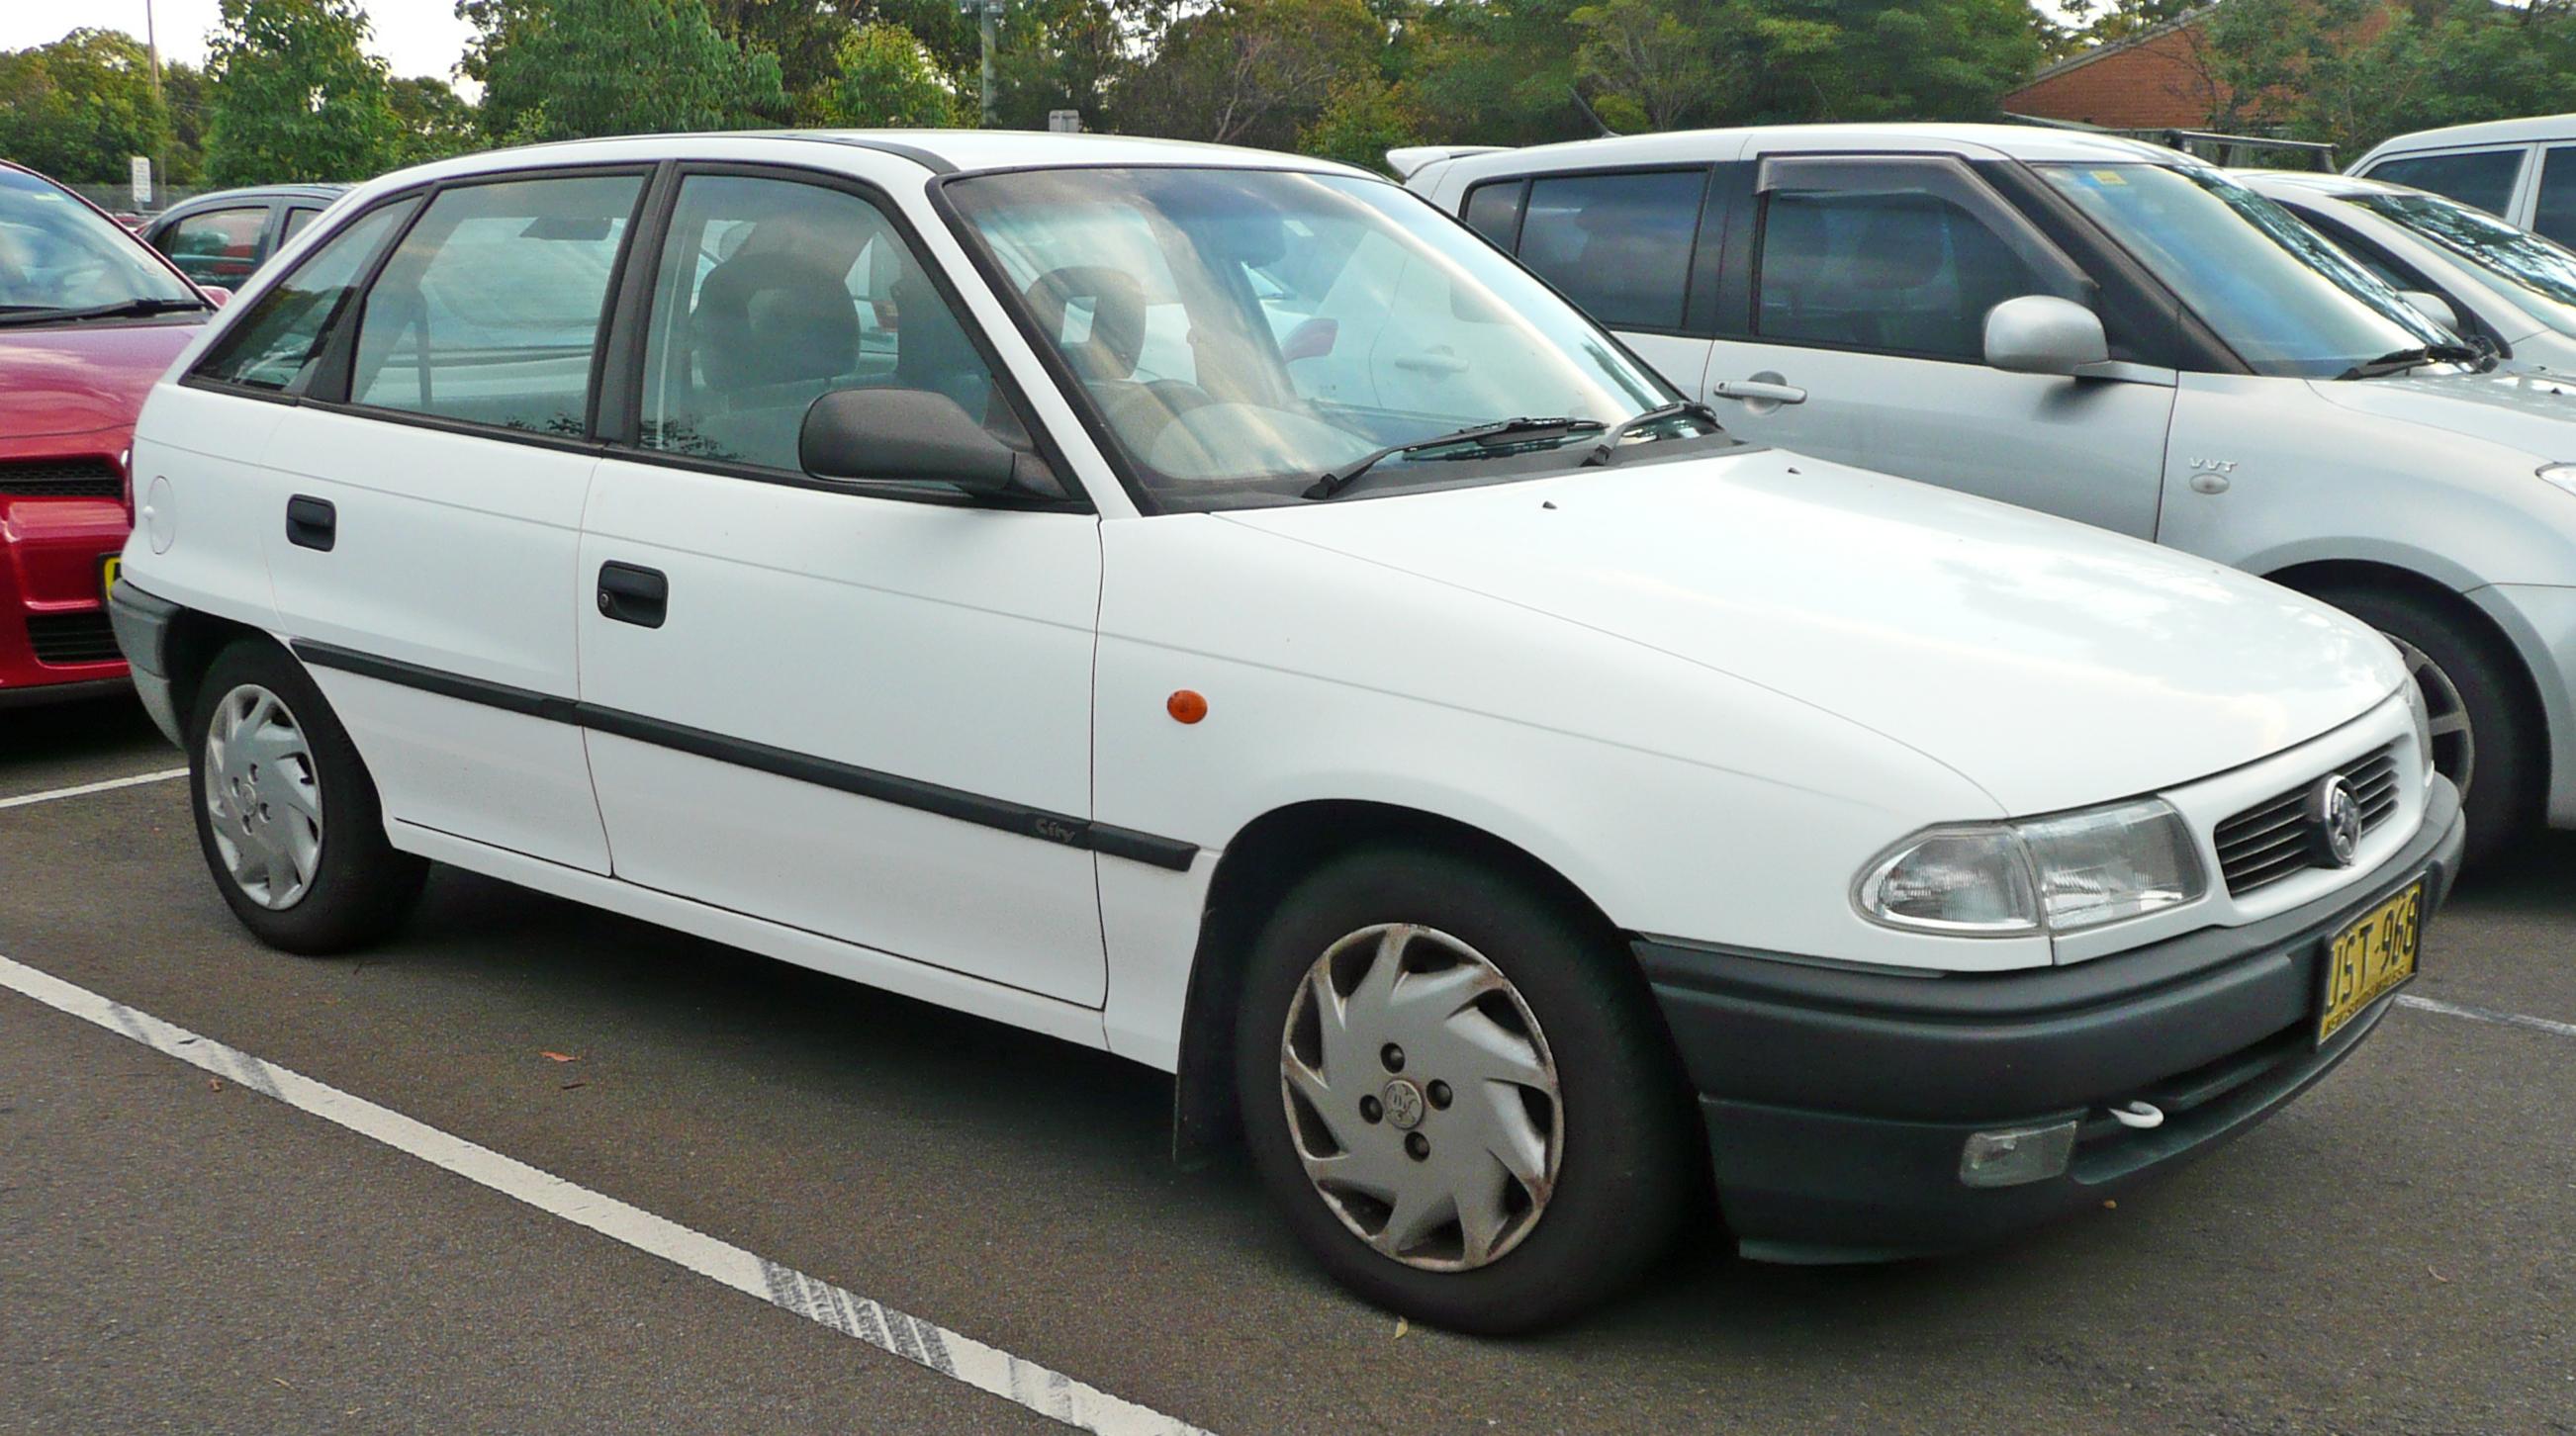 Holden Astra Tr Manual Coupe Turbo Fuse Box File 1996 1998 City 5 Door Hatchback 06 Rh Commons Wikimedia Org Sedan